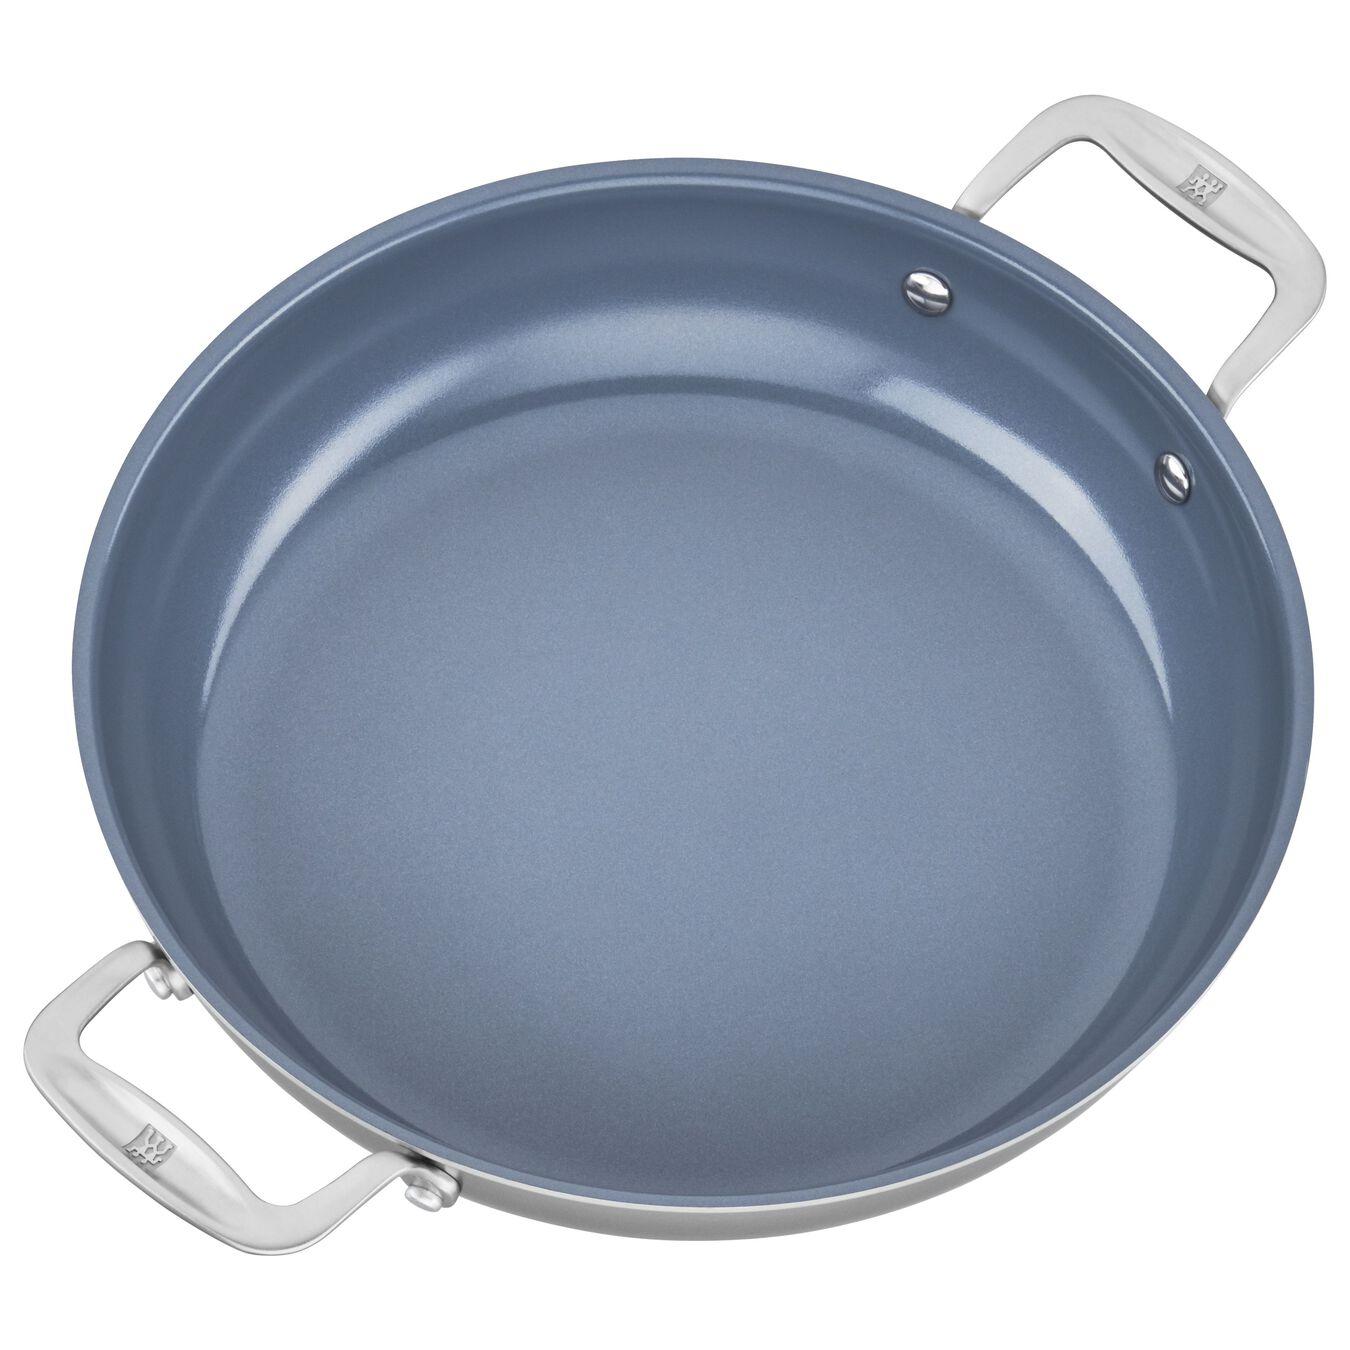 3-ply 4-qt Stainless Steel Ceramic Nonstick Braiser,,large 3